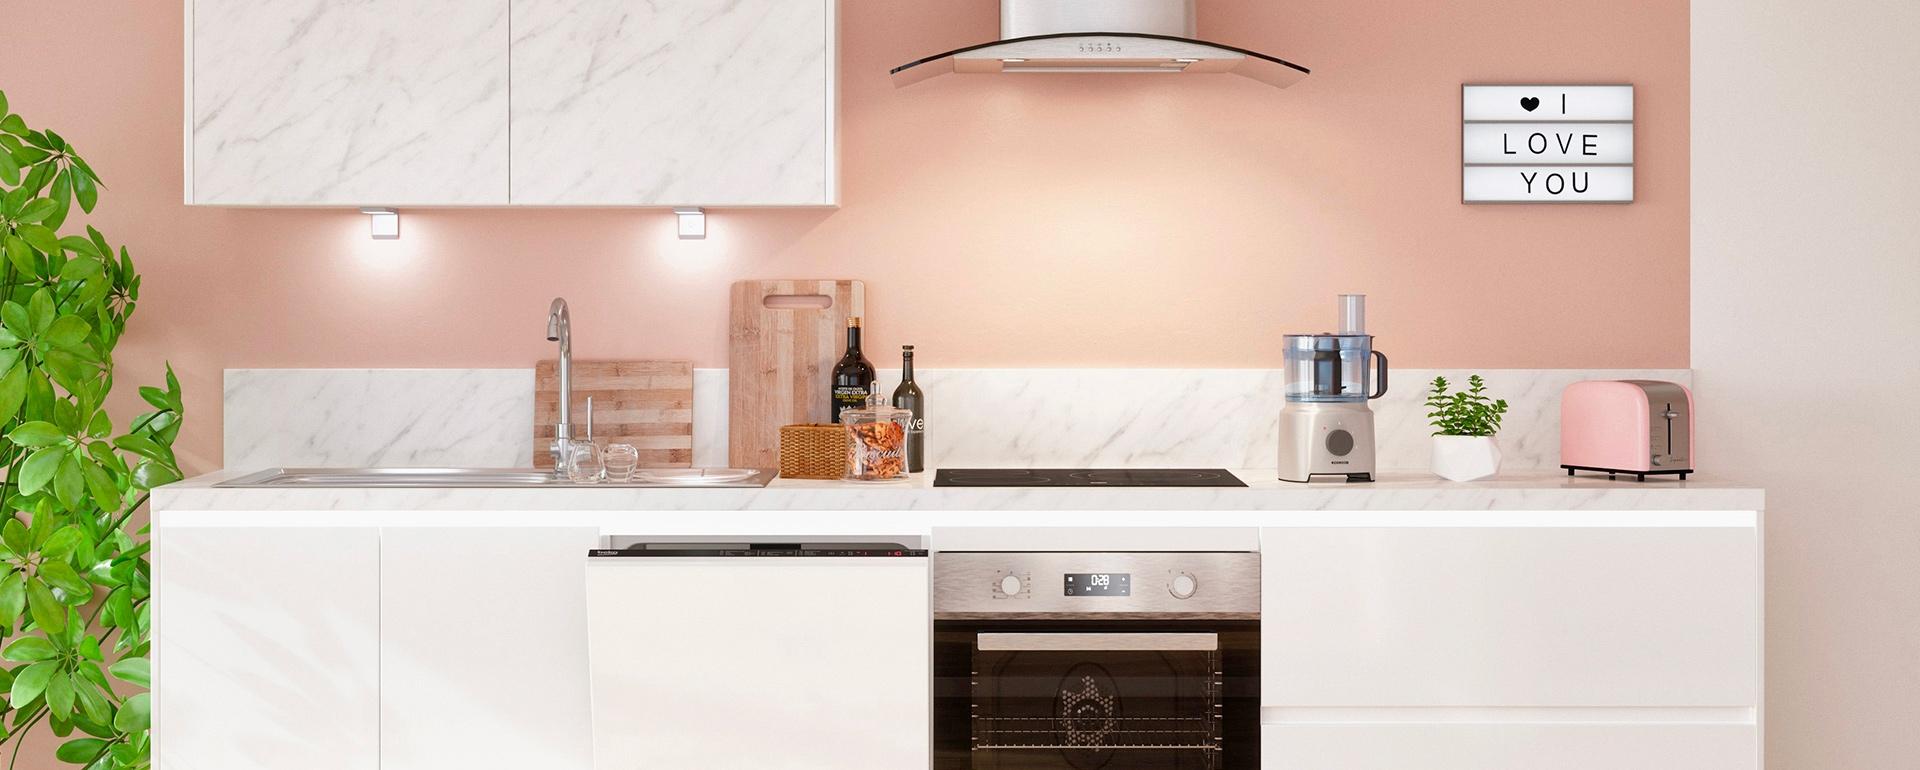 cuisine iris. Black Bedroom Furniture Sets. Home Design Ideas